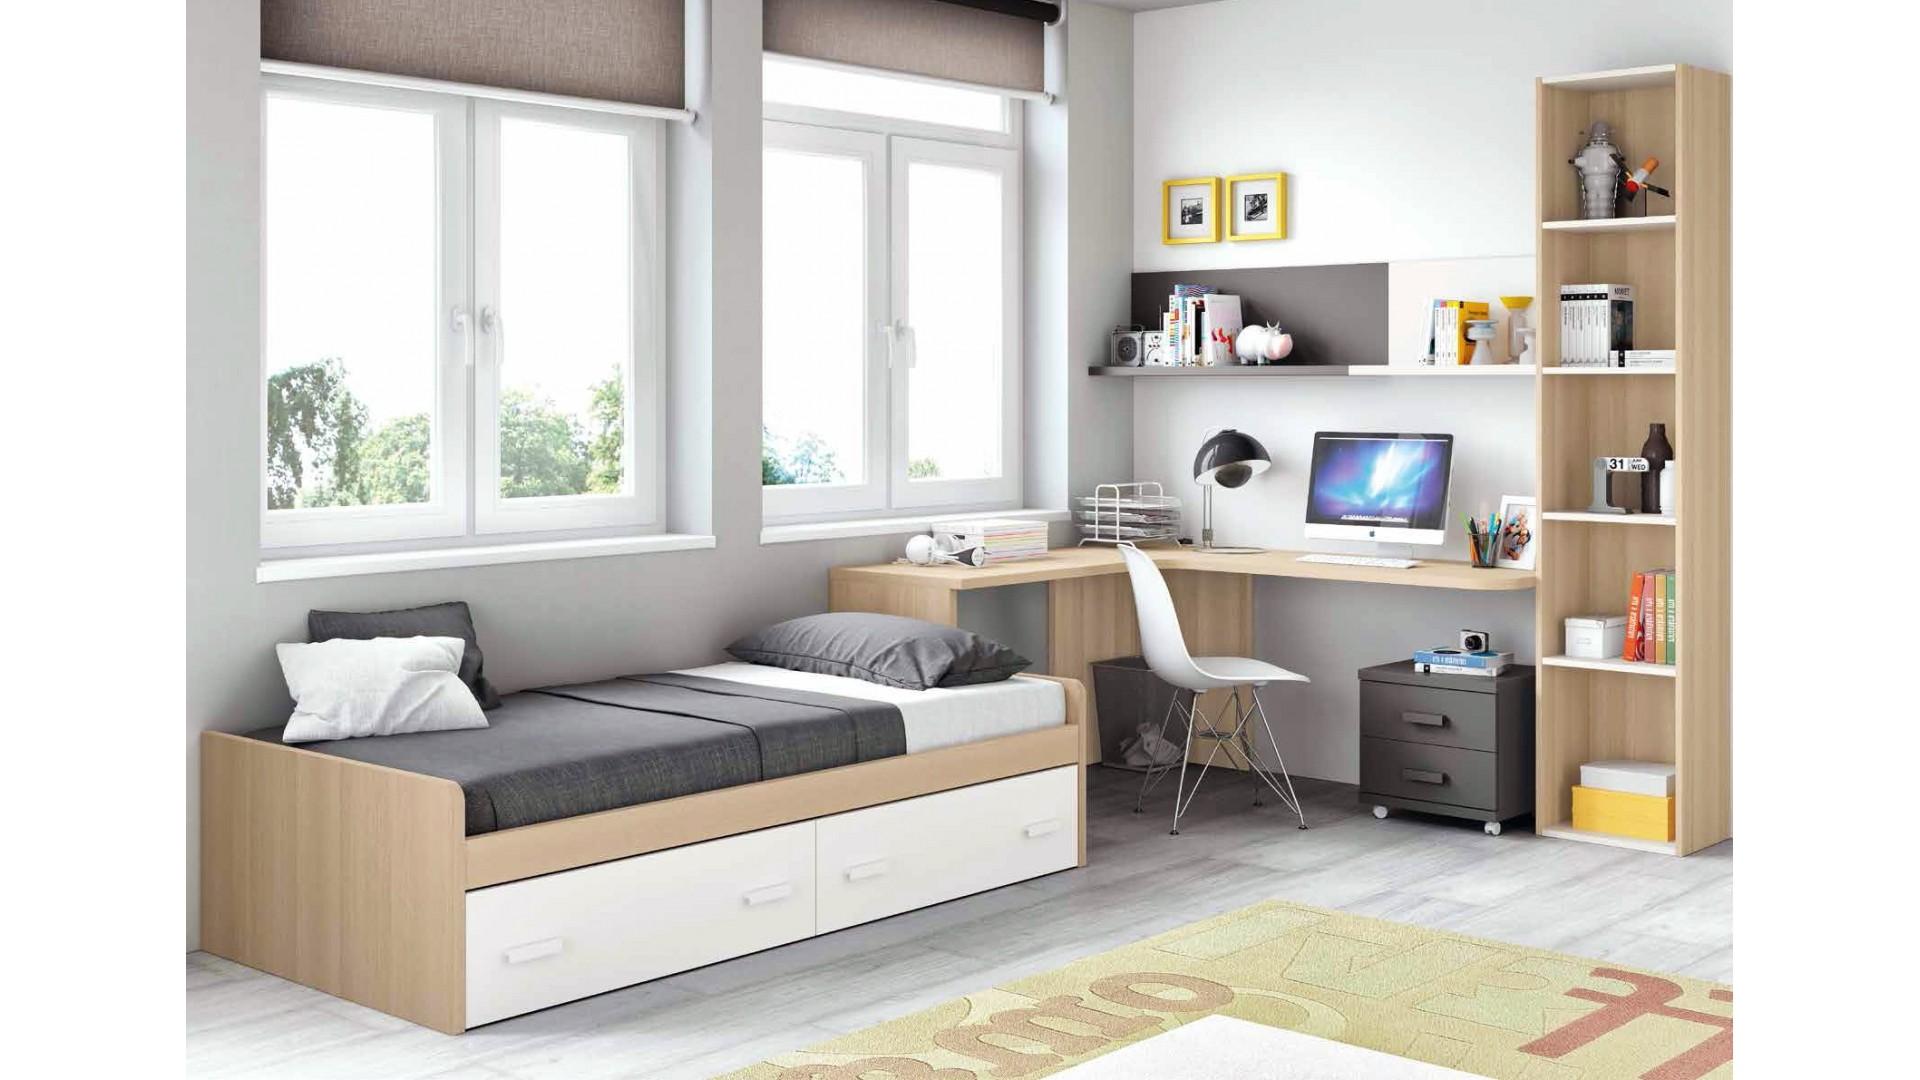 Chambre moderne ado et fun avec lit 2 coffres GLICERIO